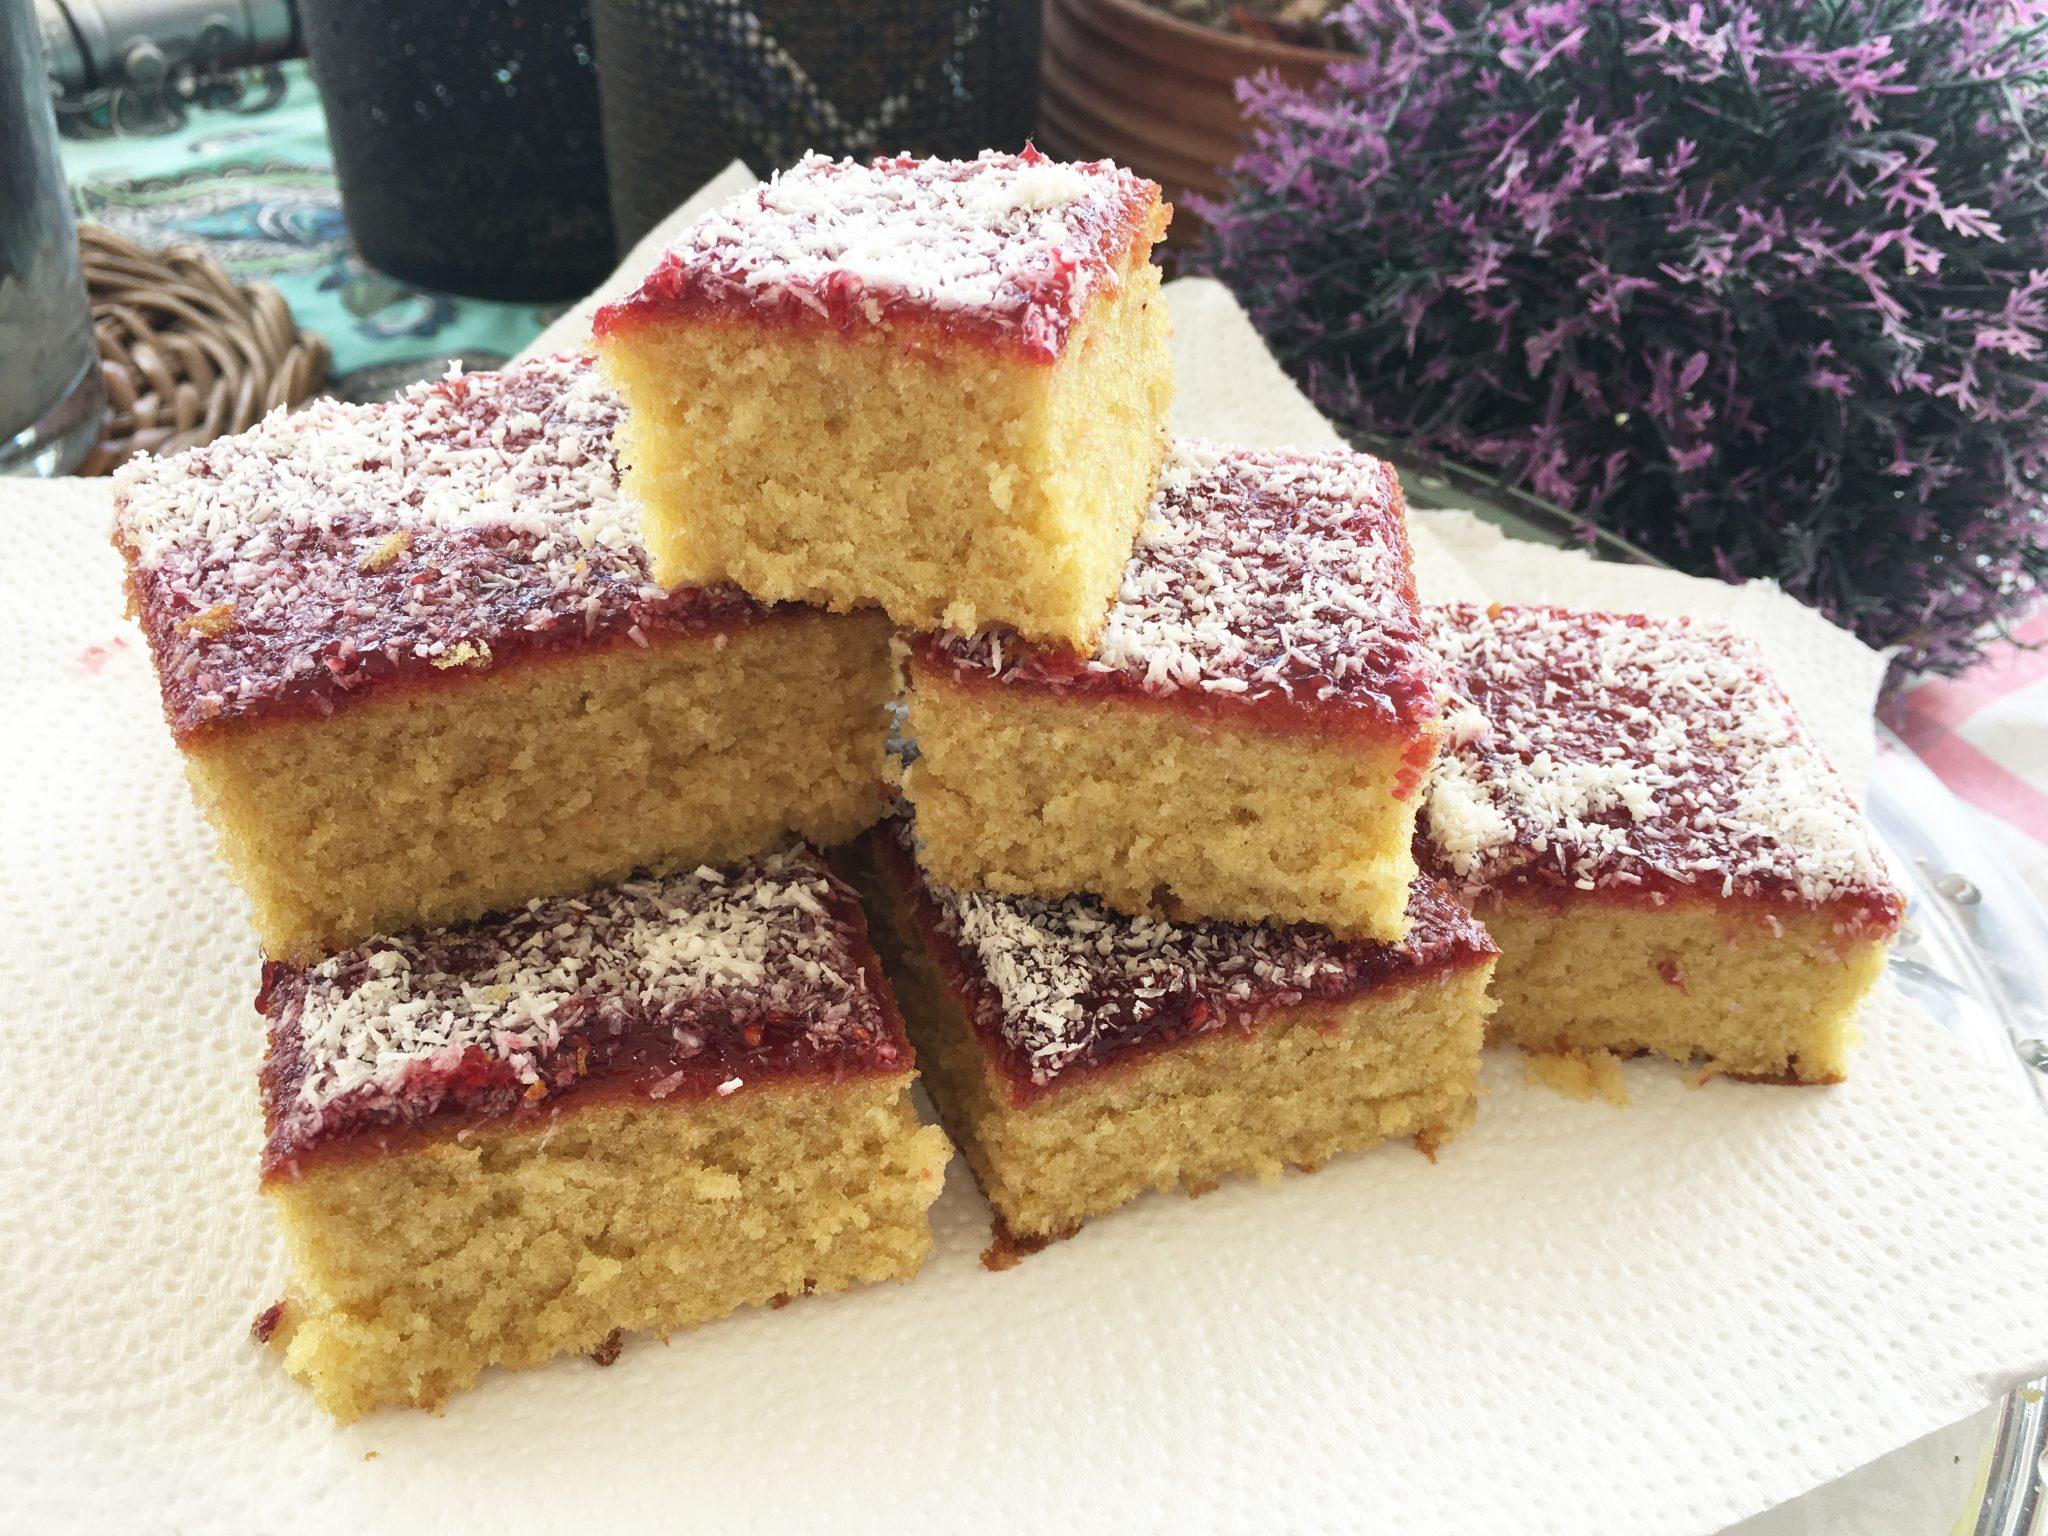 Jam and Coconut Tray Bake